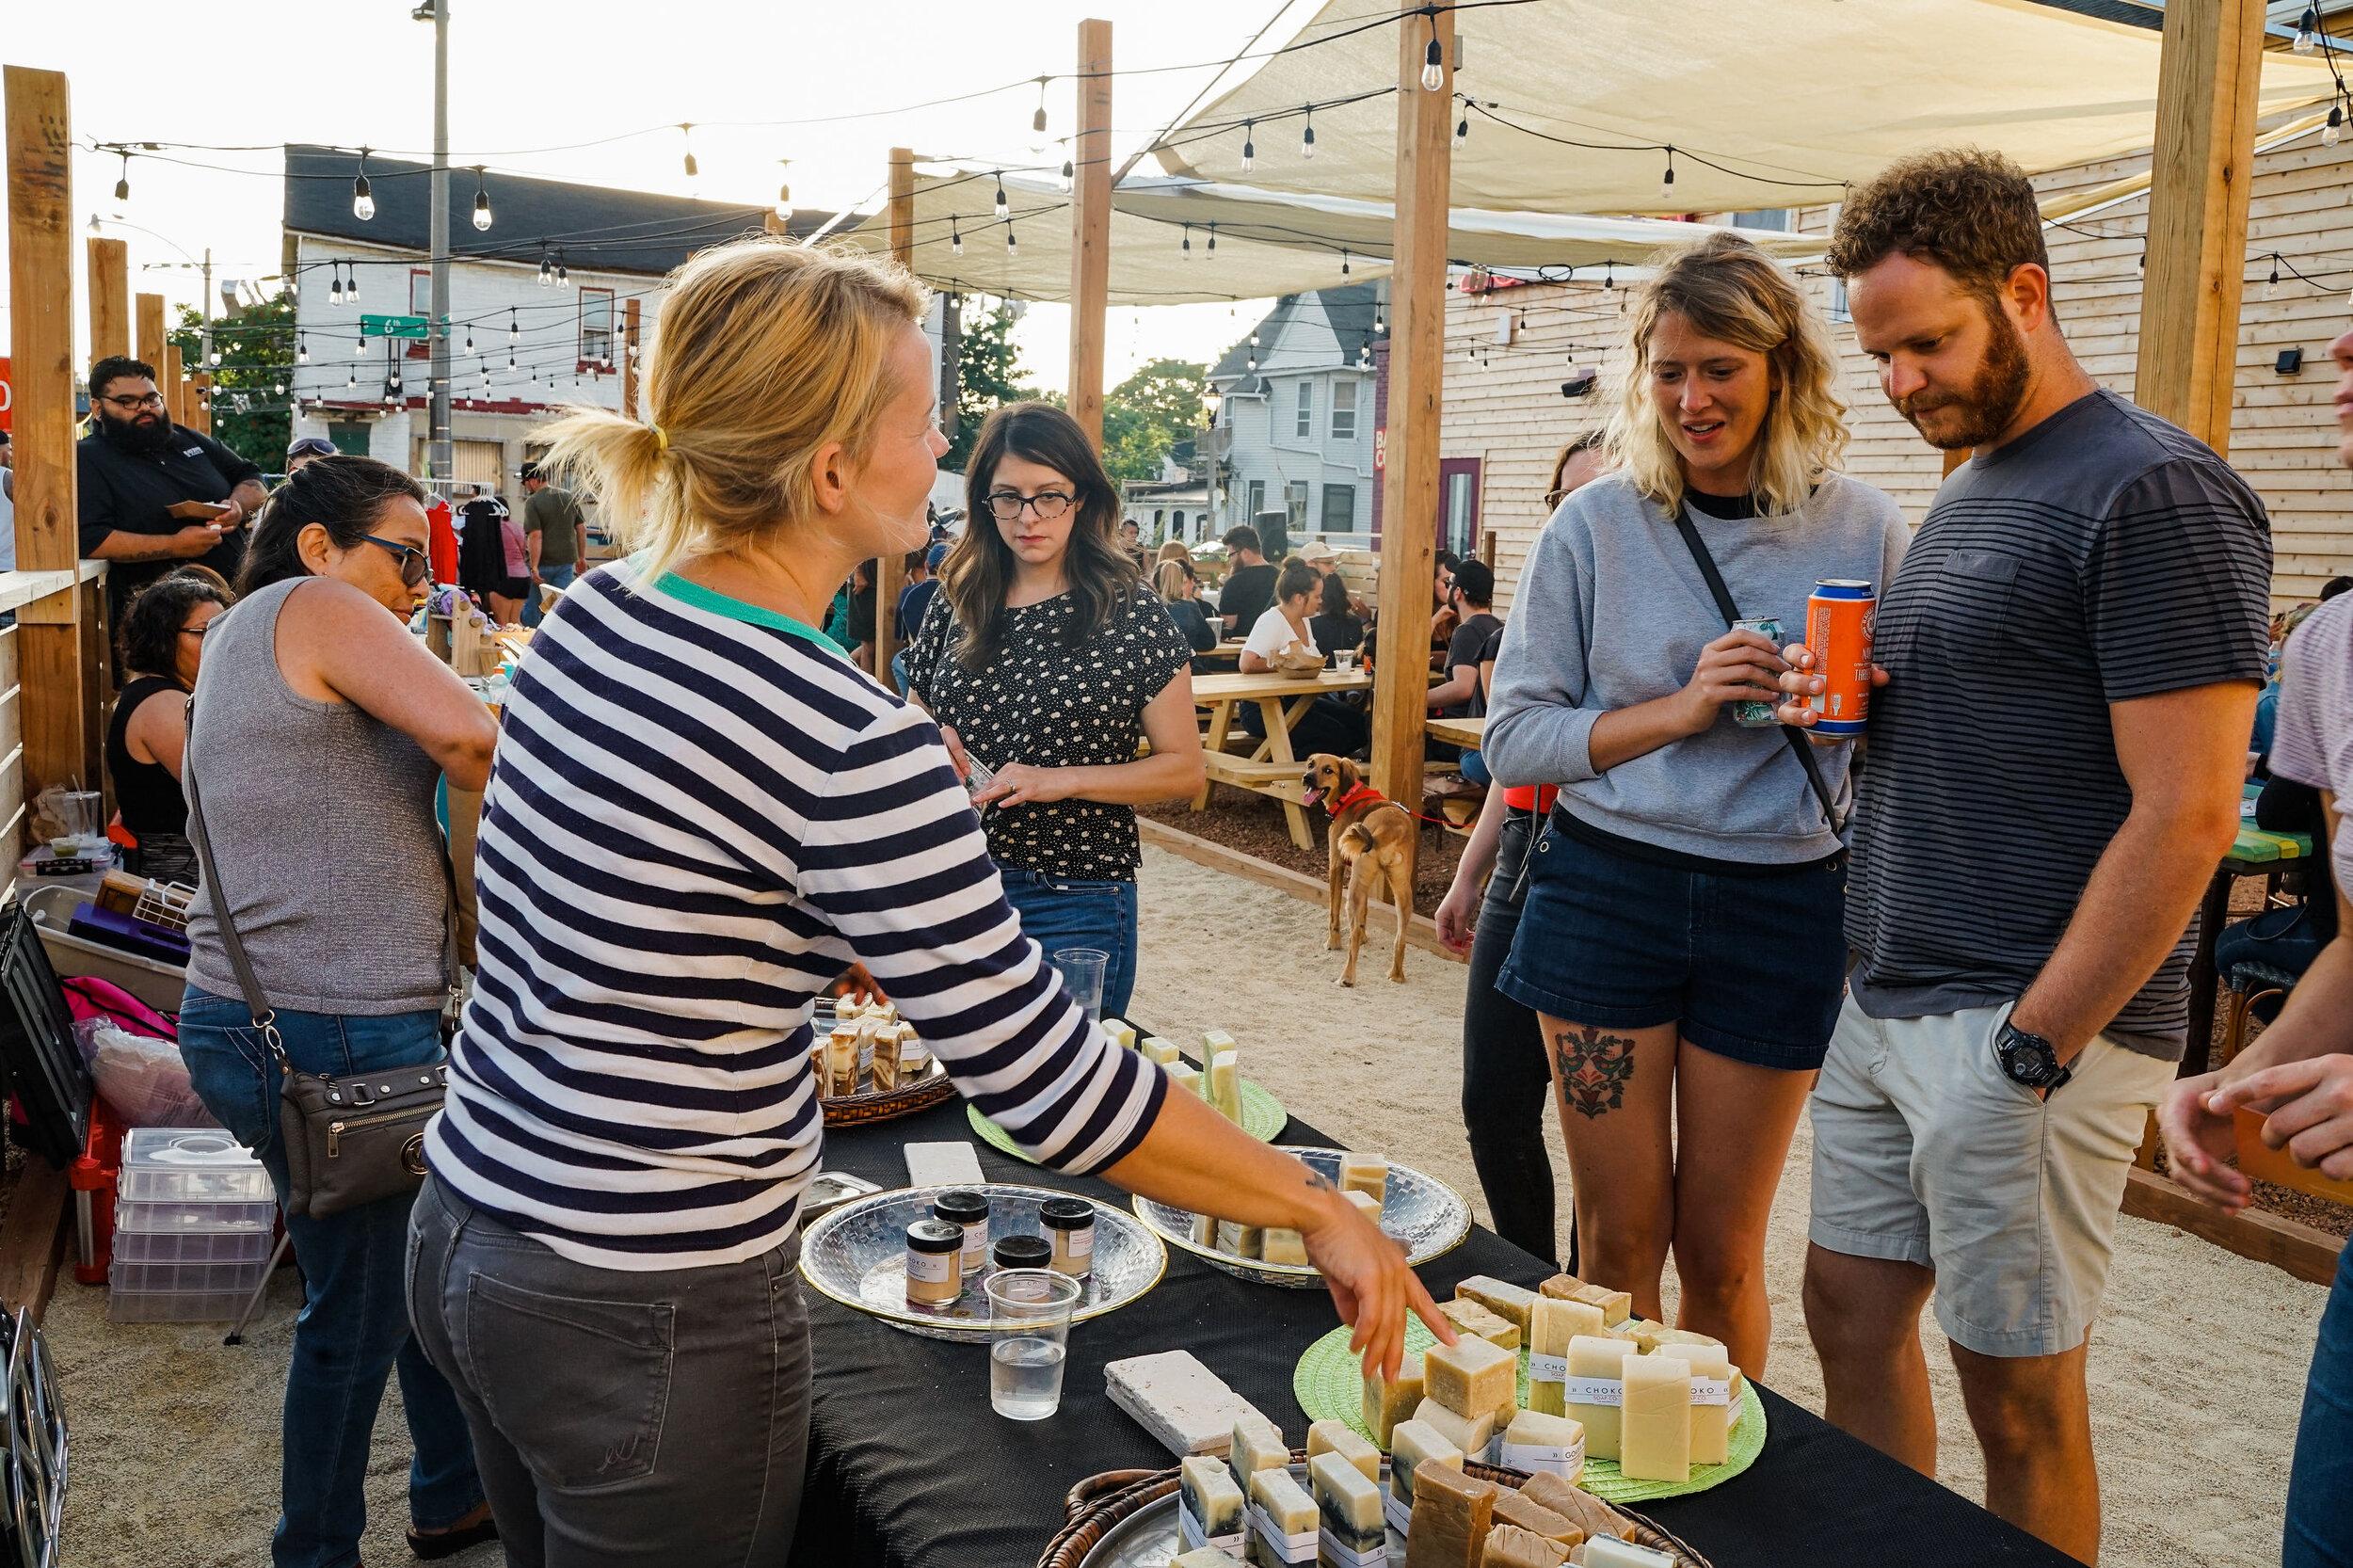 Vendors, Stephanie and Carol Alvarado from Choko Soap Co. at Bota Gala Night Market. Photo by Charlie and Taylor Photography.